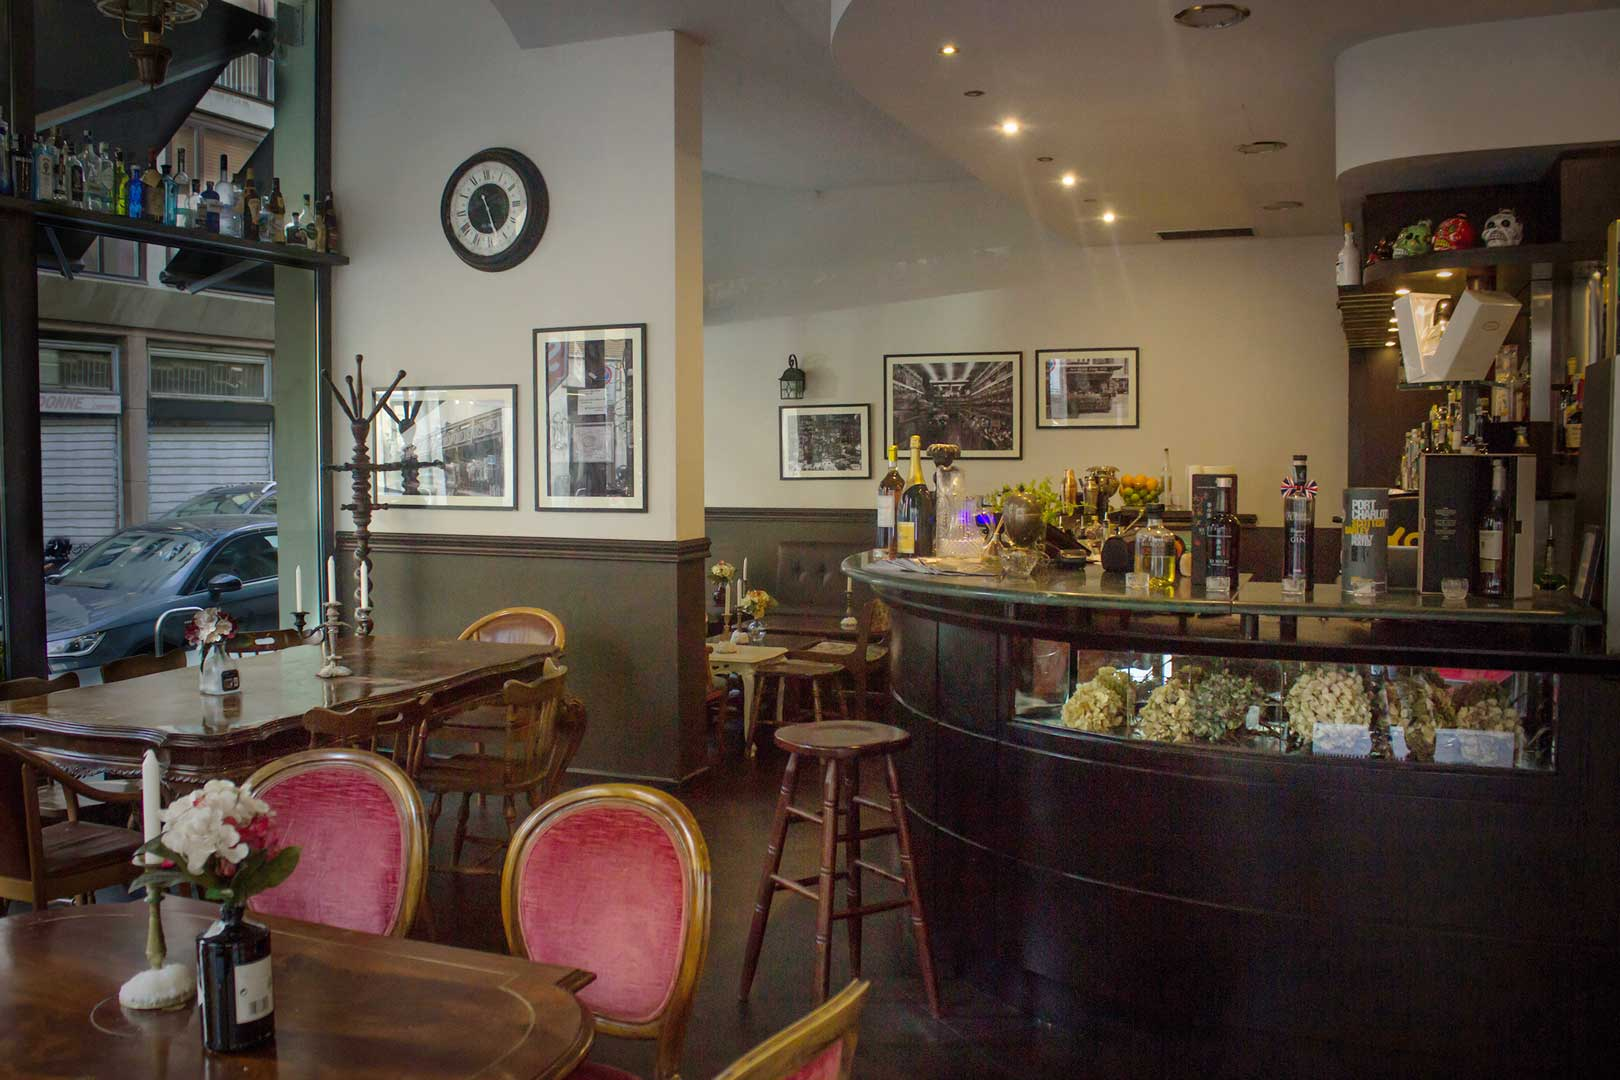 Kilburn cocktail bar flawless milano the lifestyle guide - British institute milano porta venezia ...